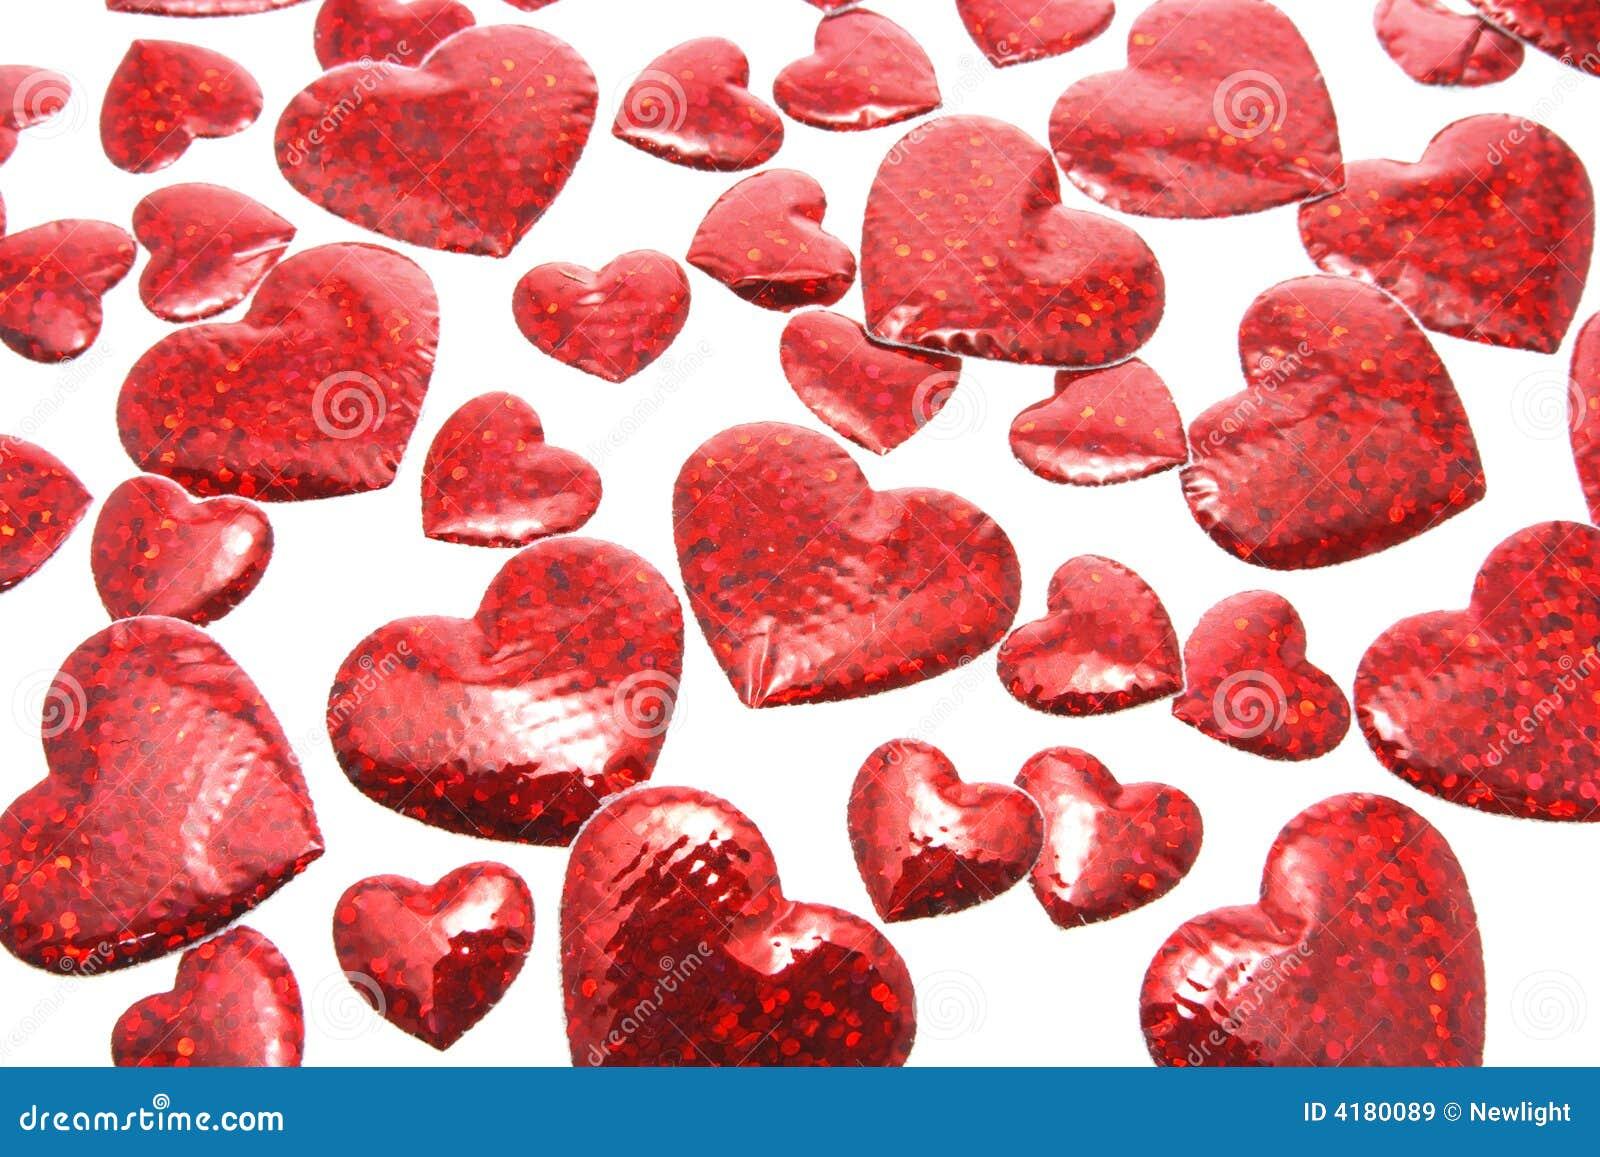 Love heart symbols stock image image of hearts concept 4180089 love heart symbols buycottarizona Image collections